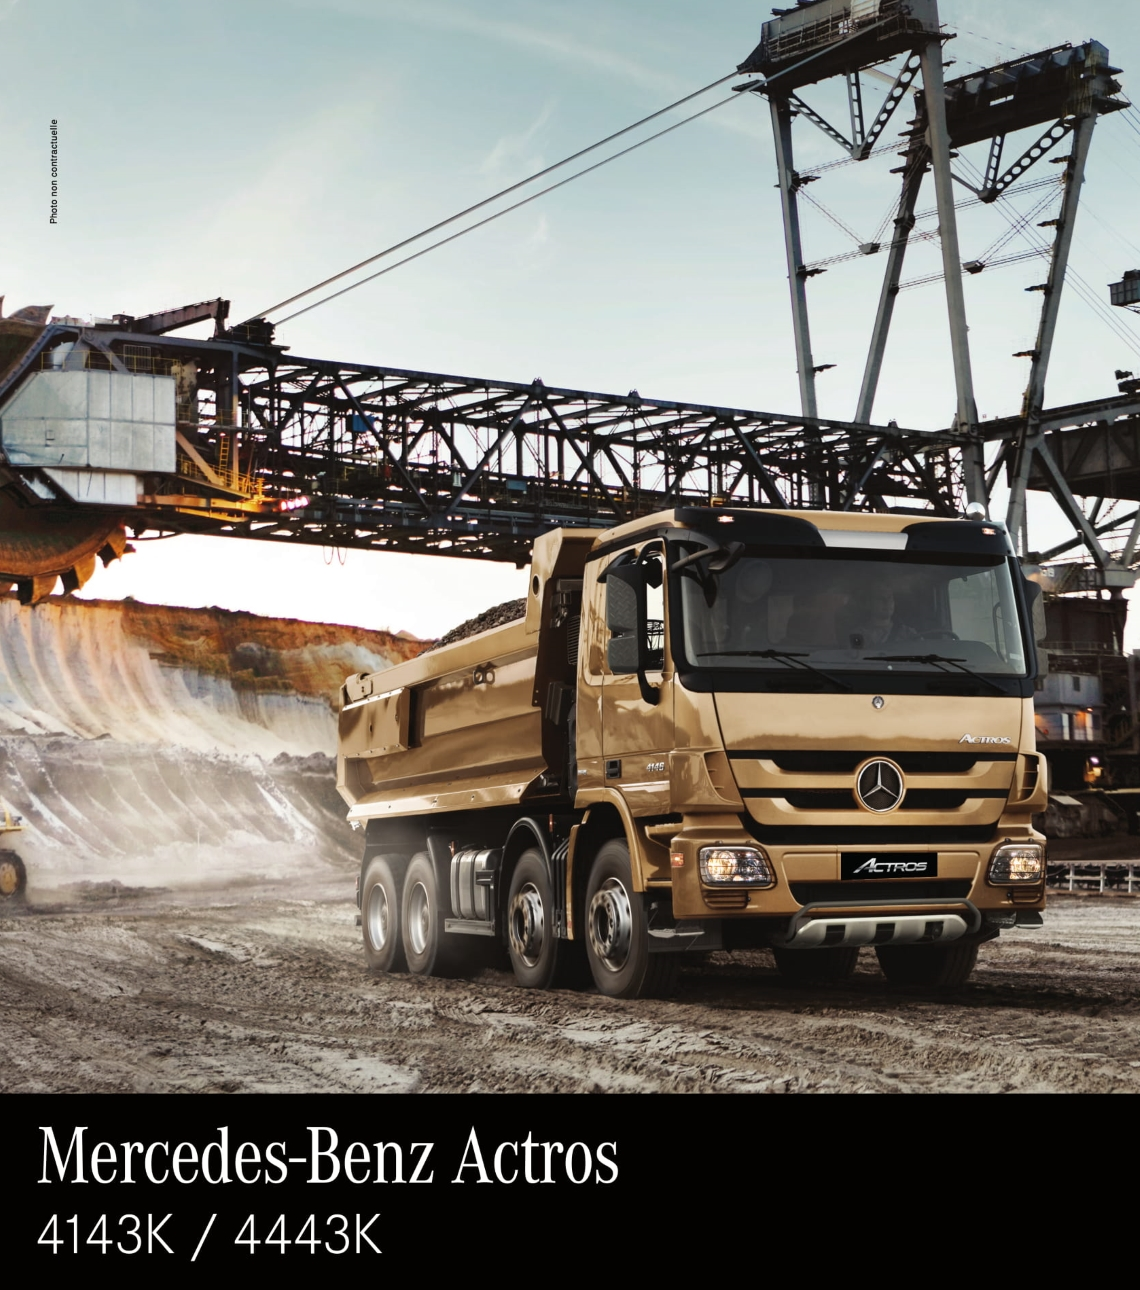 Camion-Mercedes-Benz-Actros4143K-4443-Camion-porteur-8x4-tunisie